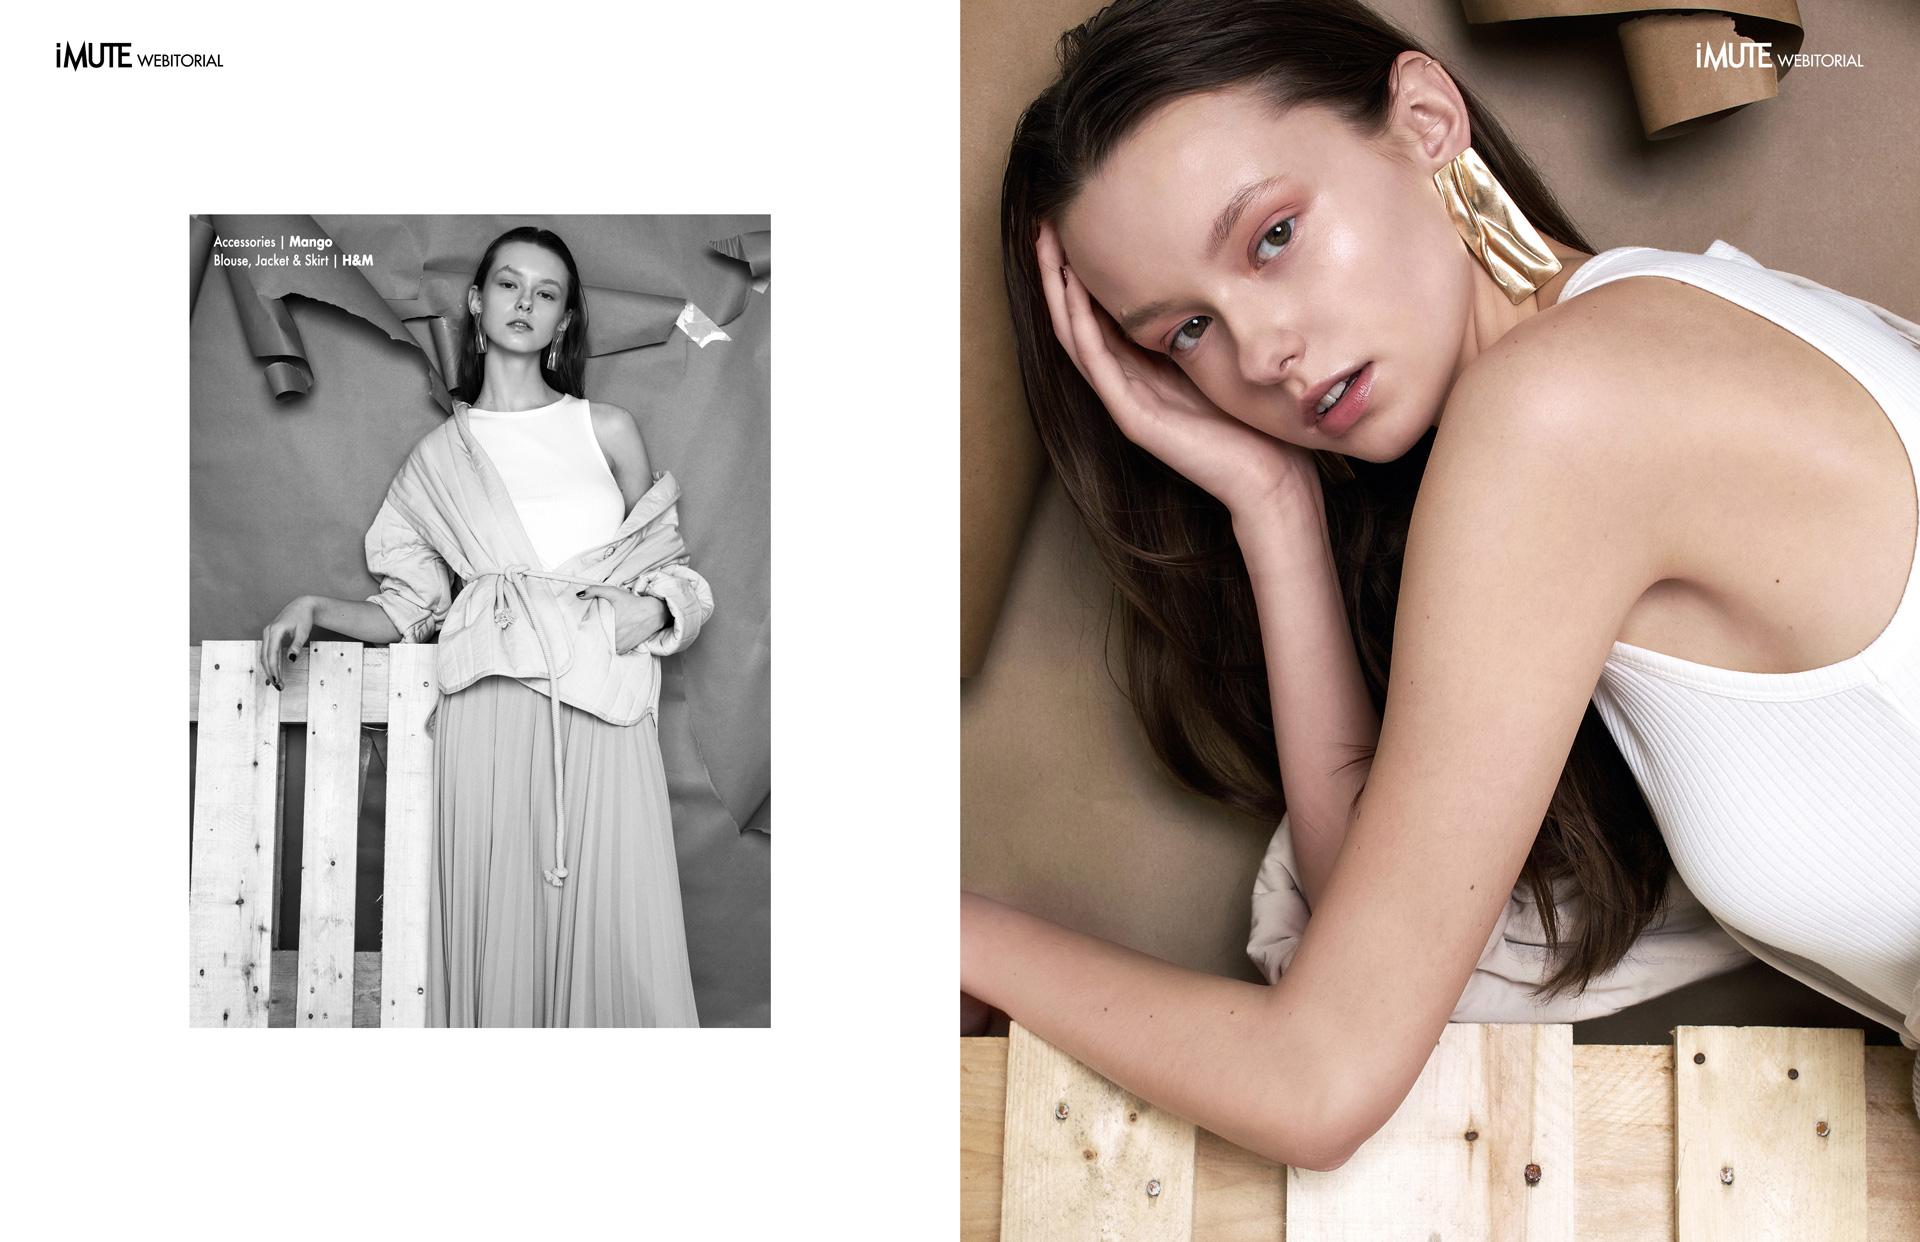 EWA webitorial for iMute Magazine Photographer   Vaidas Jokubauskas Model   Ewa Borowska @ Ruta Model Management Stylist   Simona Senkauskaite Makeup   Kristina Raulinaityte